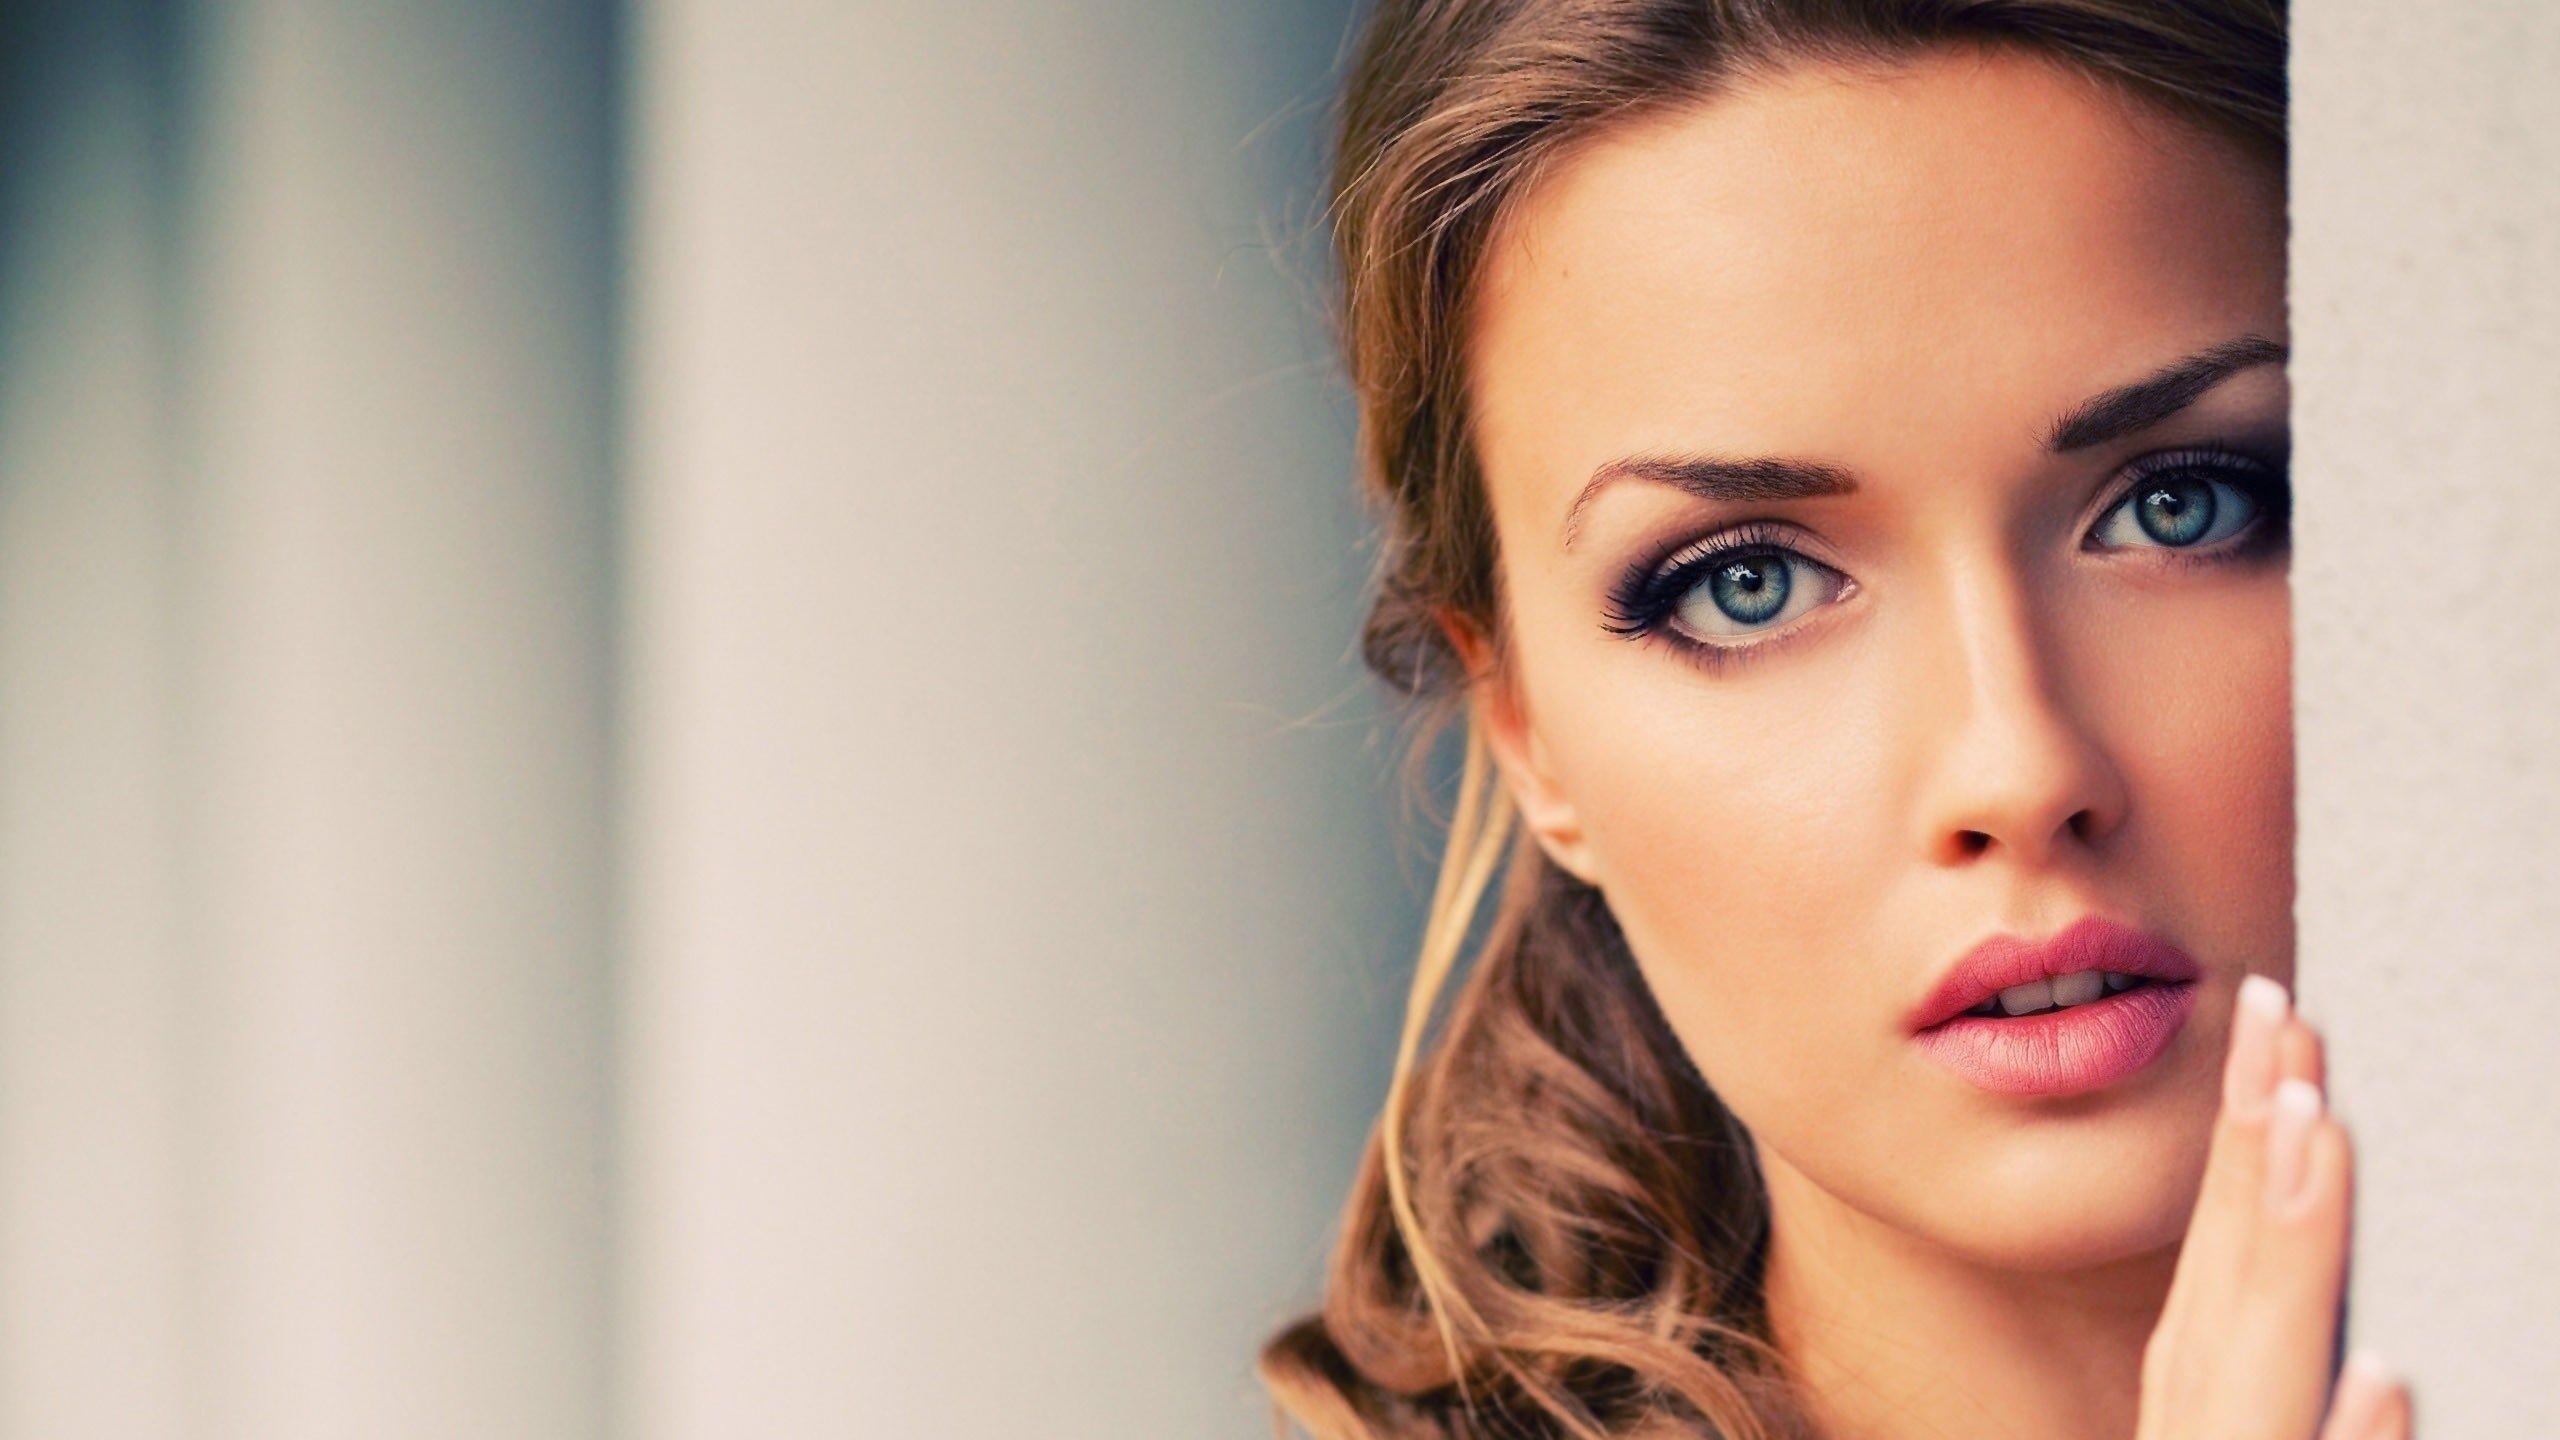 Compte à rebours  - Page 15 Girl-pretty-face-blue-eyes_2560x1440